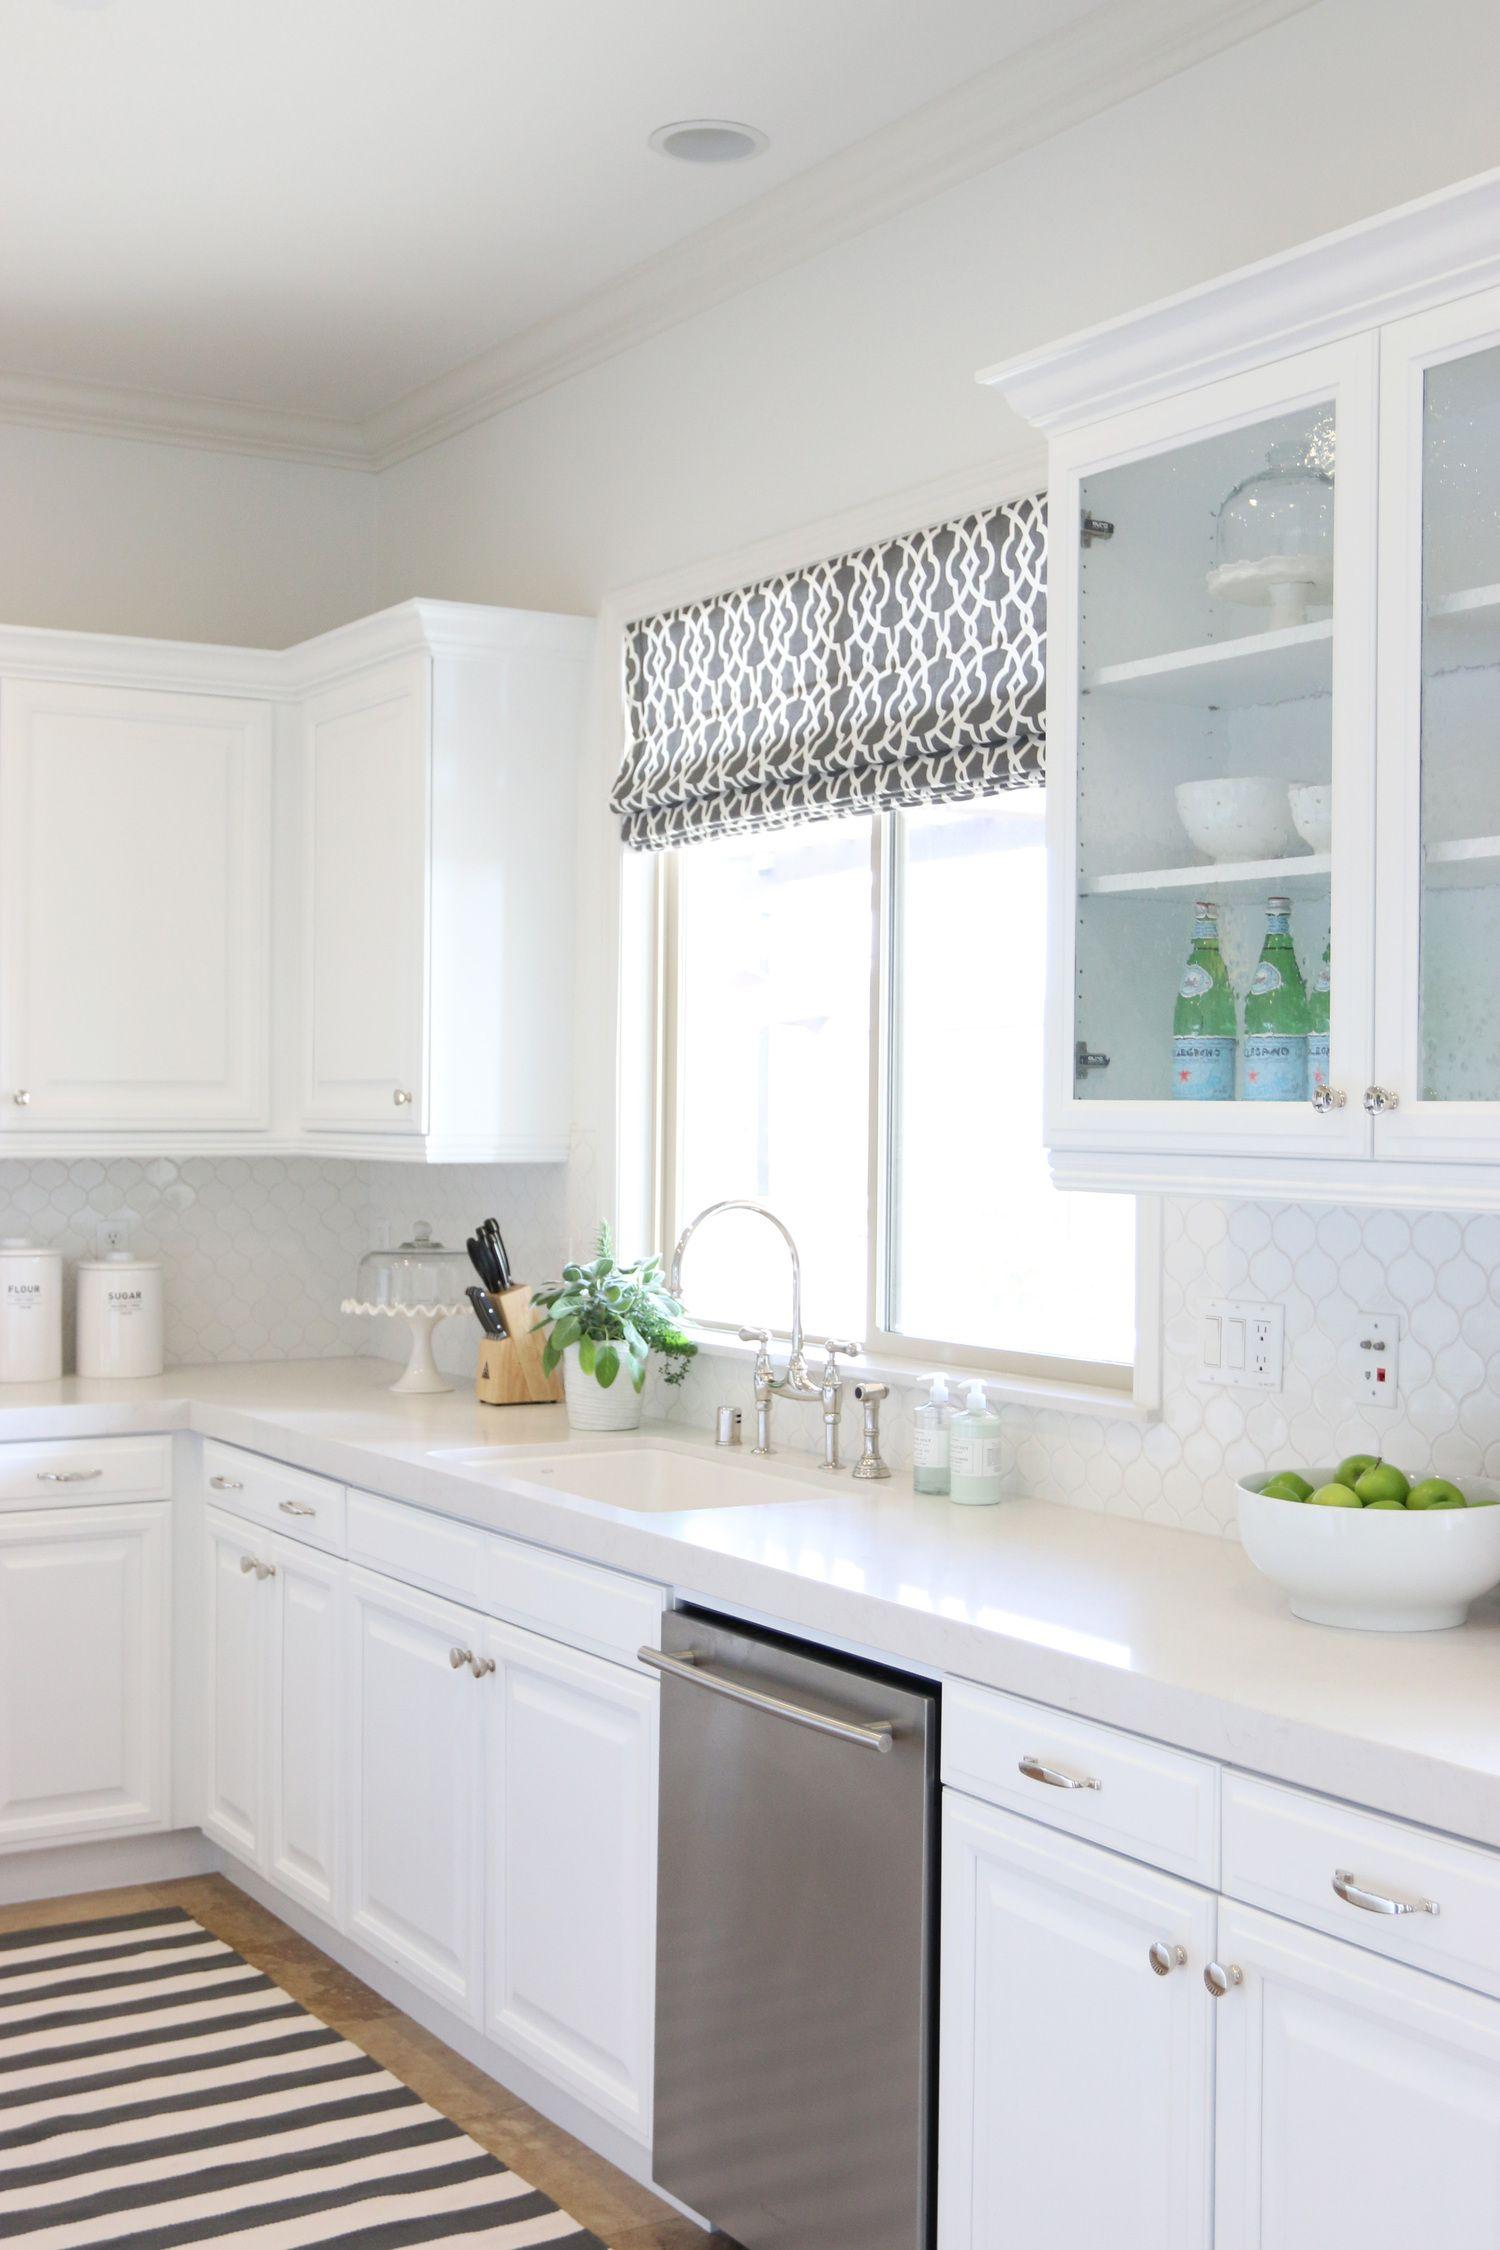 Kitchen Styling || Studio McGee | Kitchen | Pinterest ...